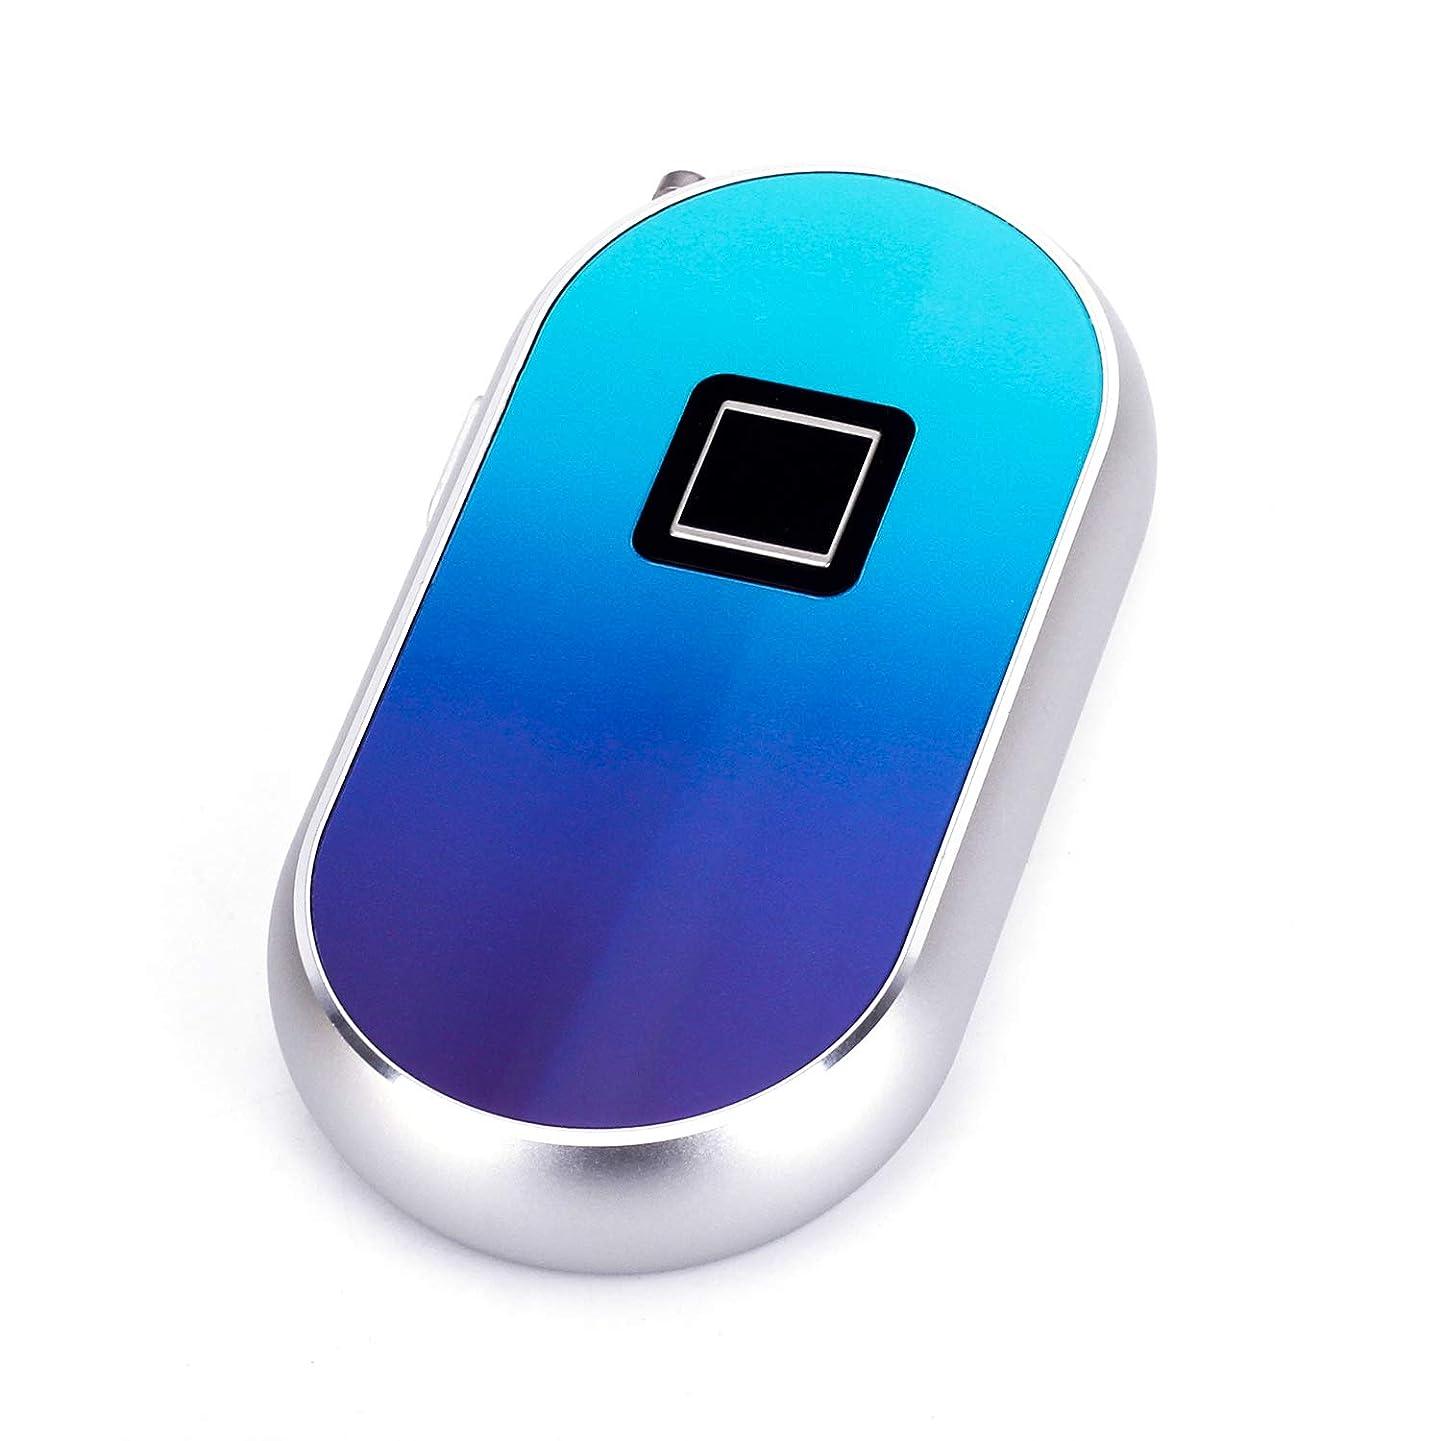 ROYAL DEFENDER Fingerprint Lock 0.5s Touch Unlock Smart Biometric Lock Keyless Padlock 85db Loud alarm Anti-theft Luggage Cable Lock,suitable for Backpack Handbag Suitcase (Blue)